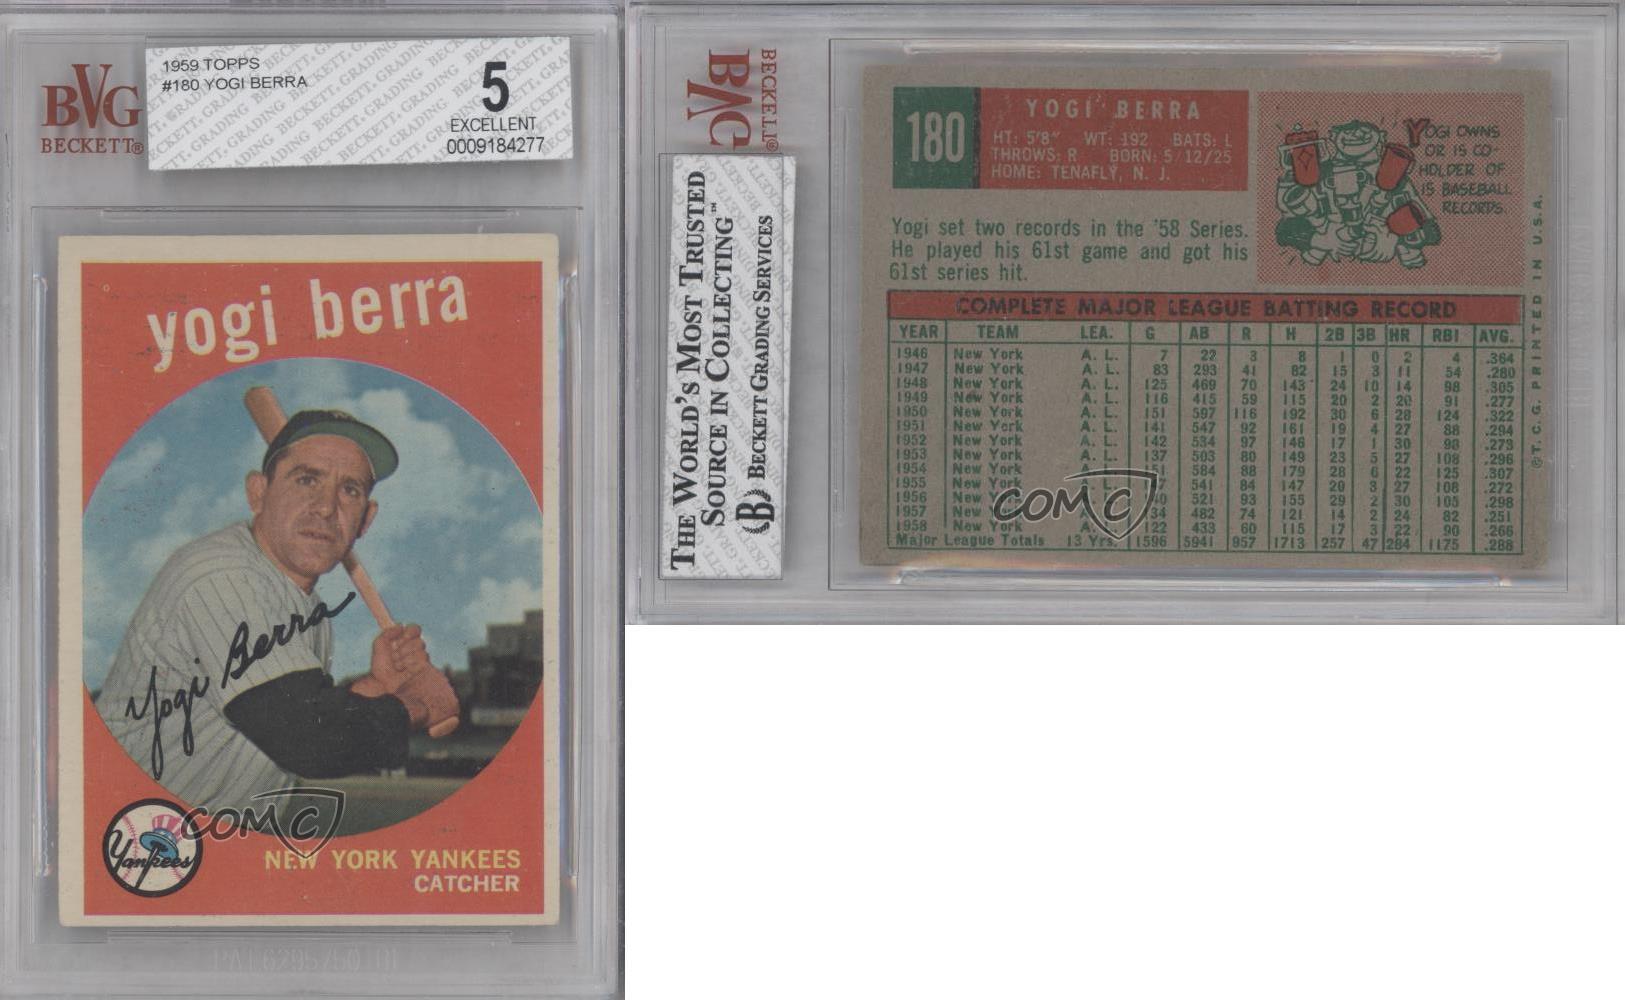 1959 topps 180 yogi berra bvg 5 new york yankees baseball card ebay. Black Bedroom Furniture Sets. Home Design Ideas